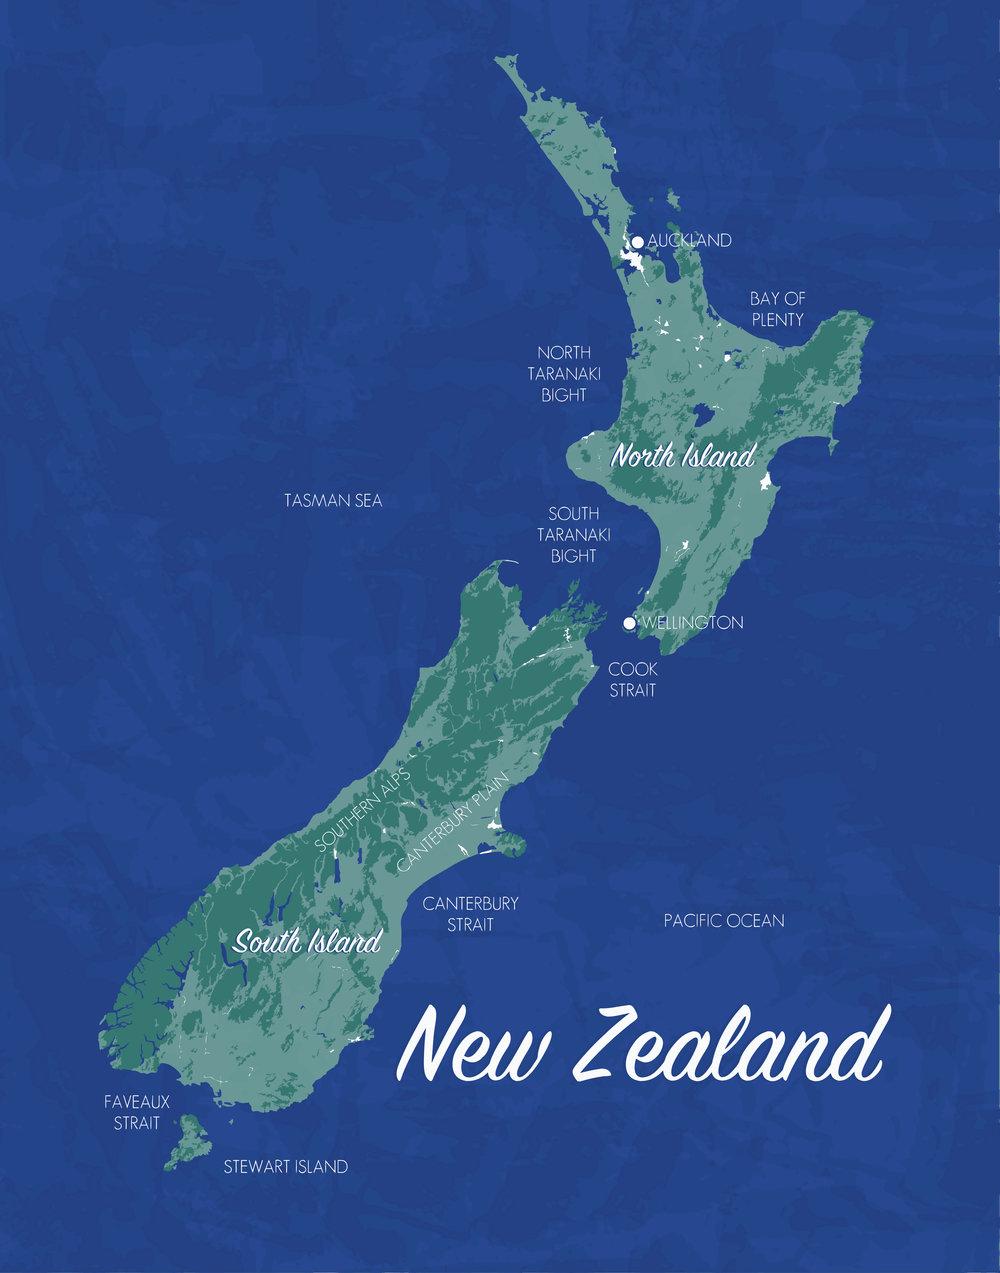 New Zealand, 2016